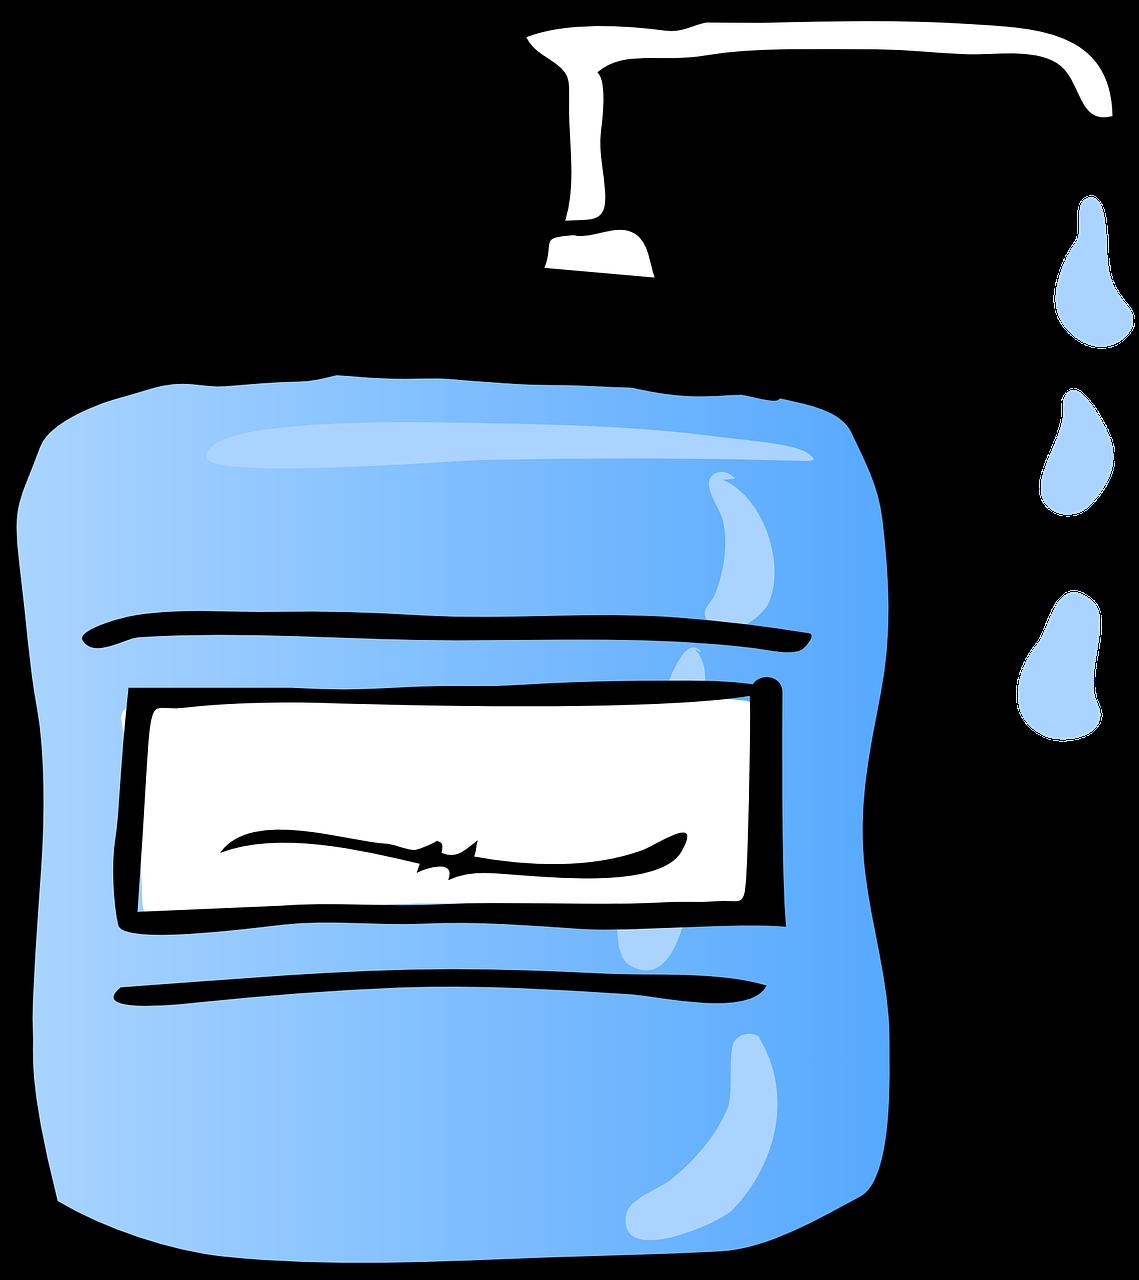 Hand Sanitizer Free Clip Art Images Diaper Sanitizer Clip Art Png Download Full Size Clipart 71223 Pinclipart